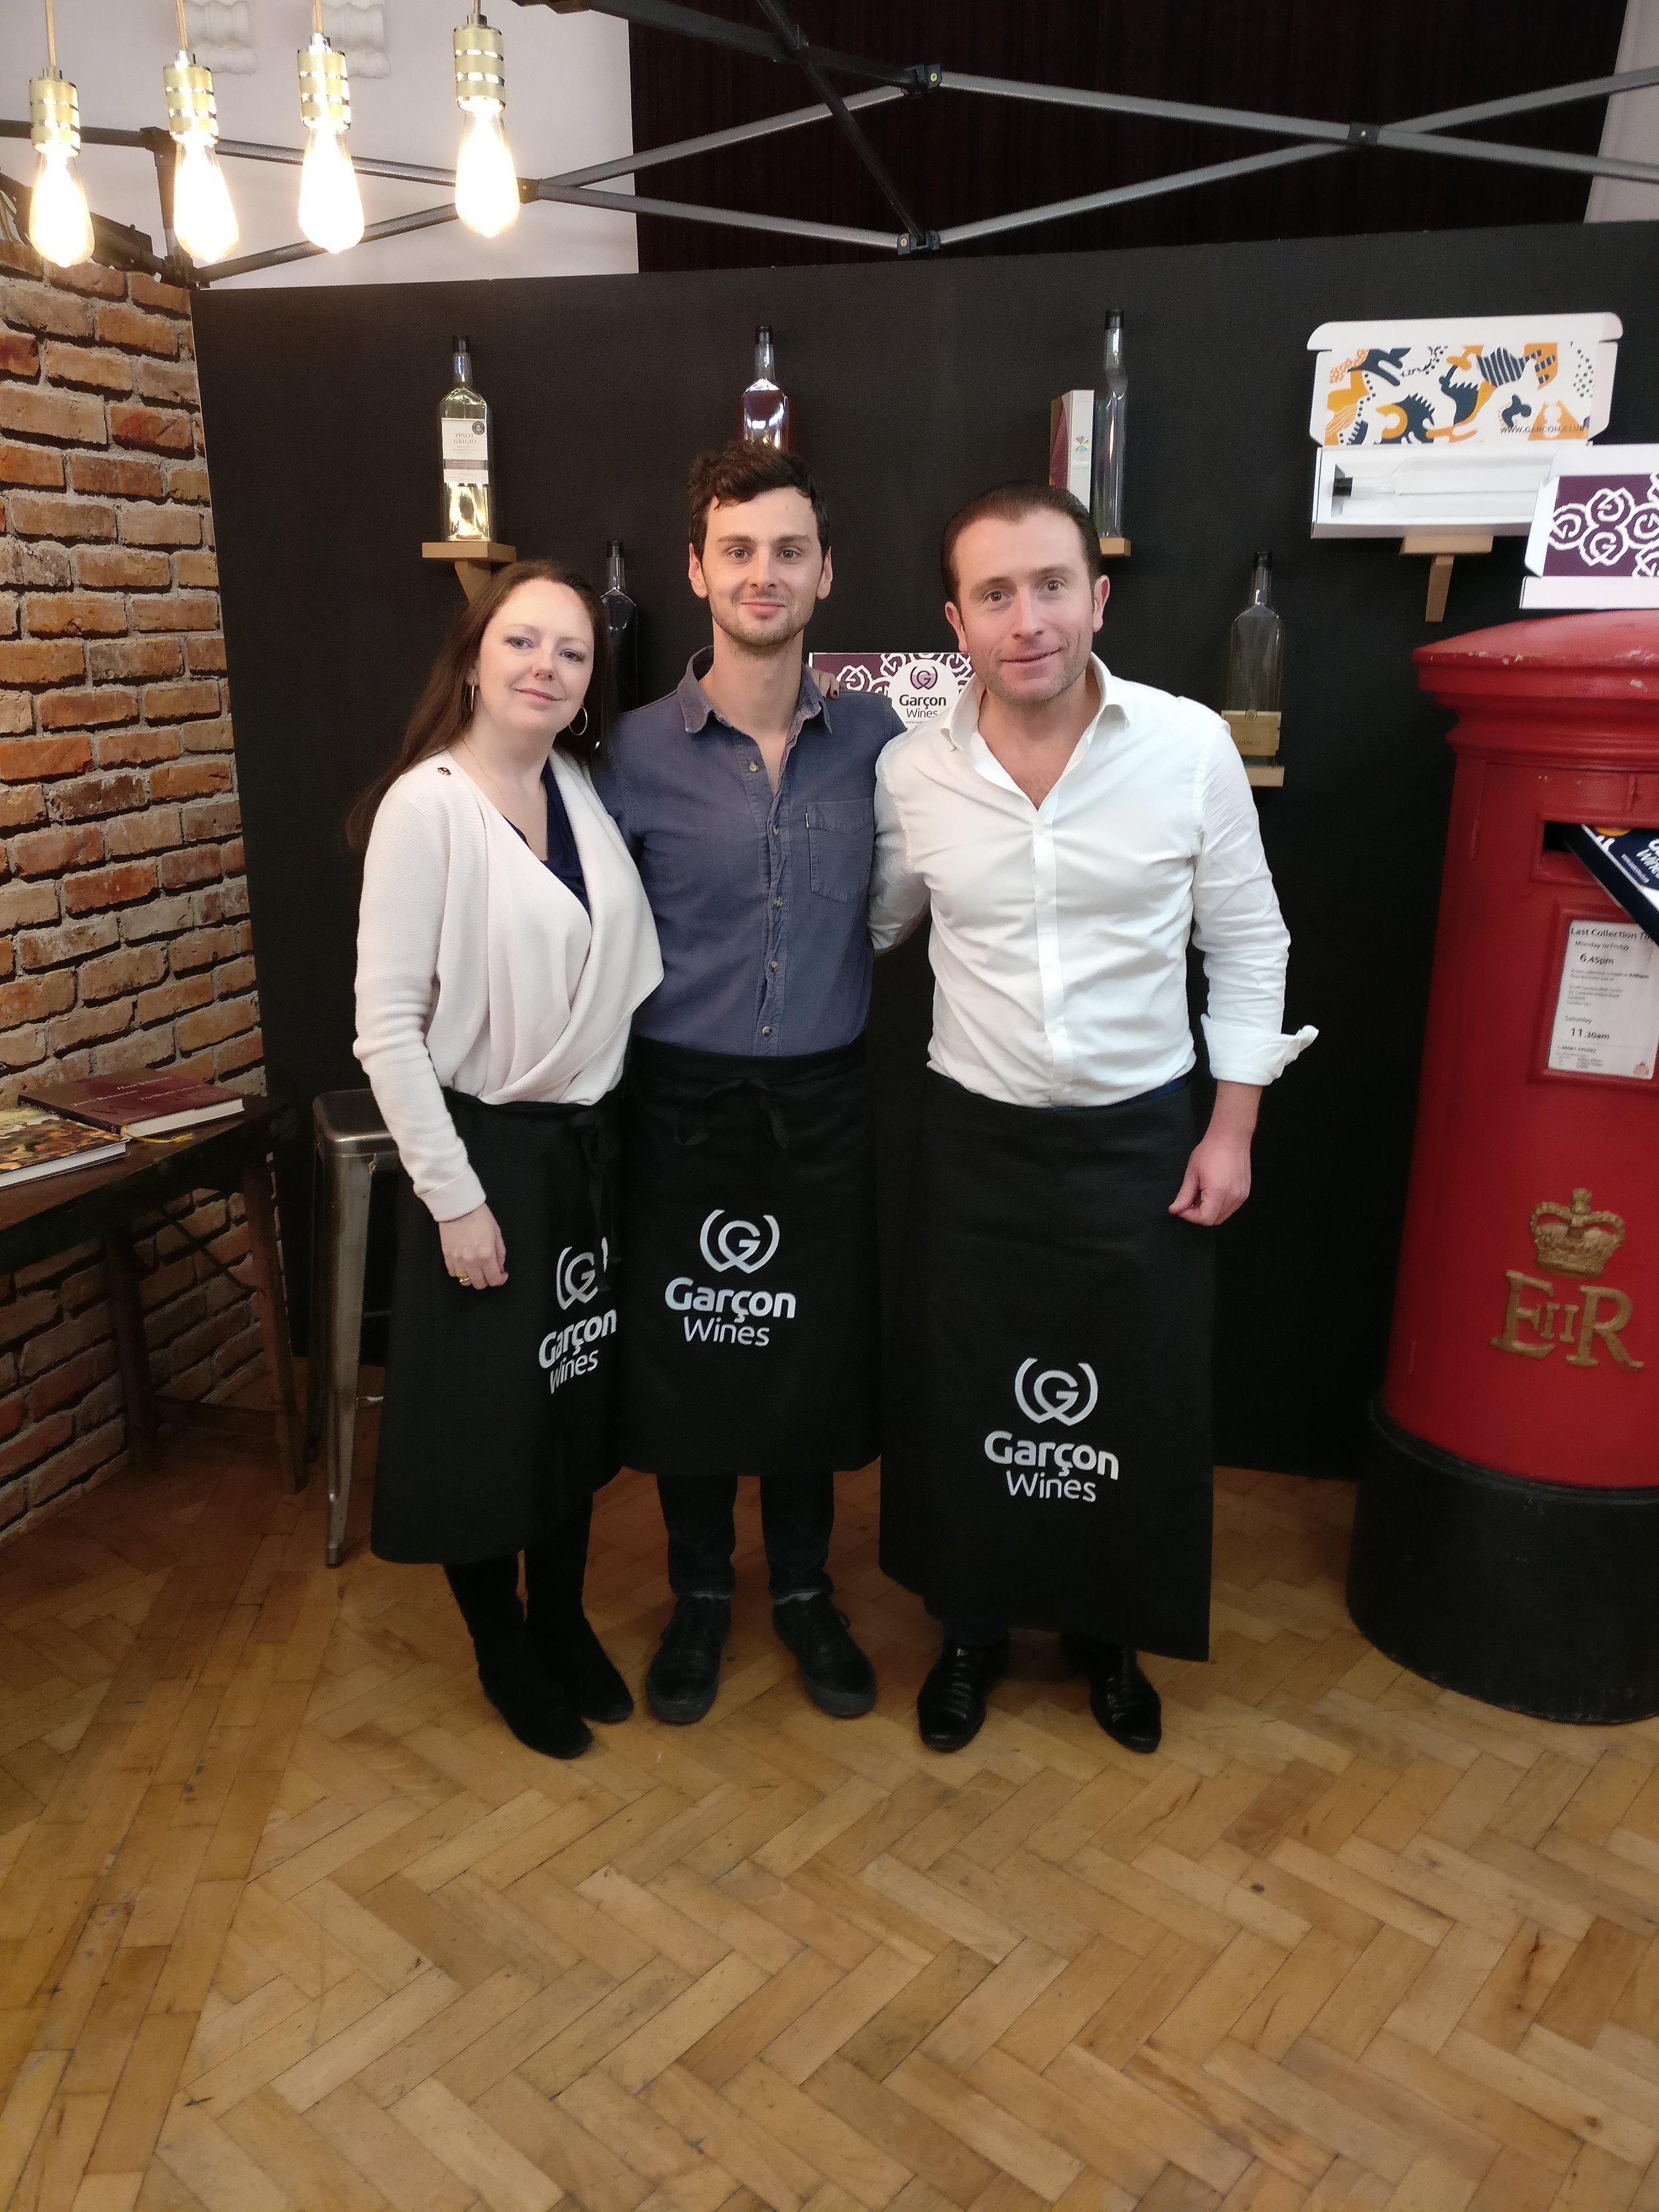 Rachel, Joe and Santiago, the team behind Garçon Wines